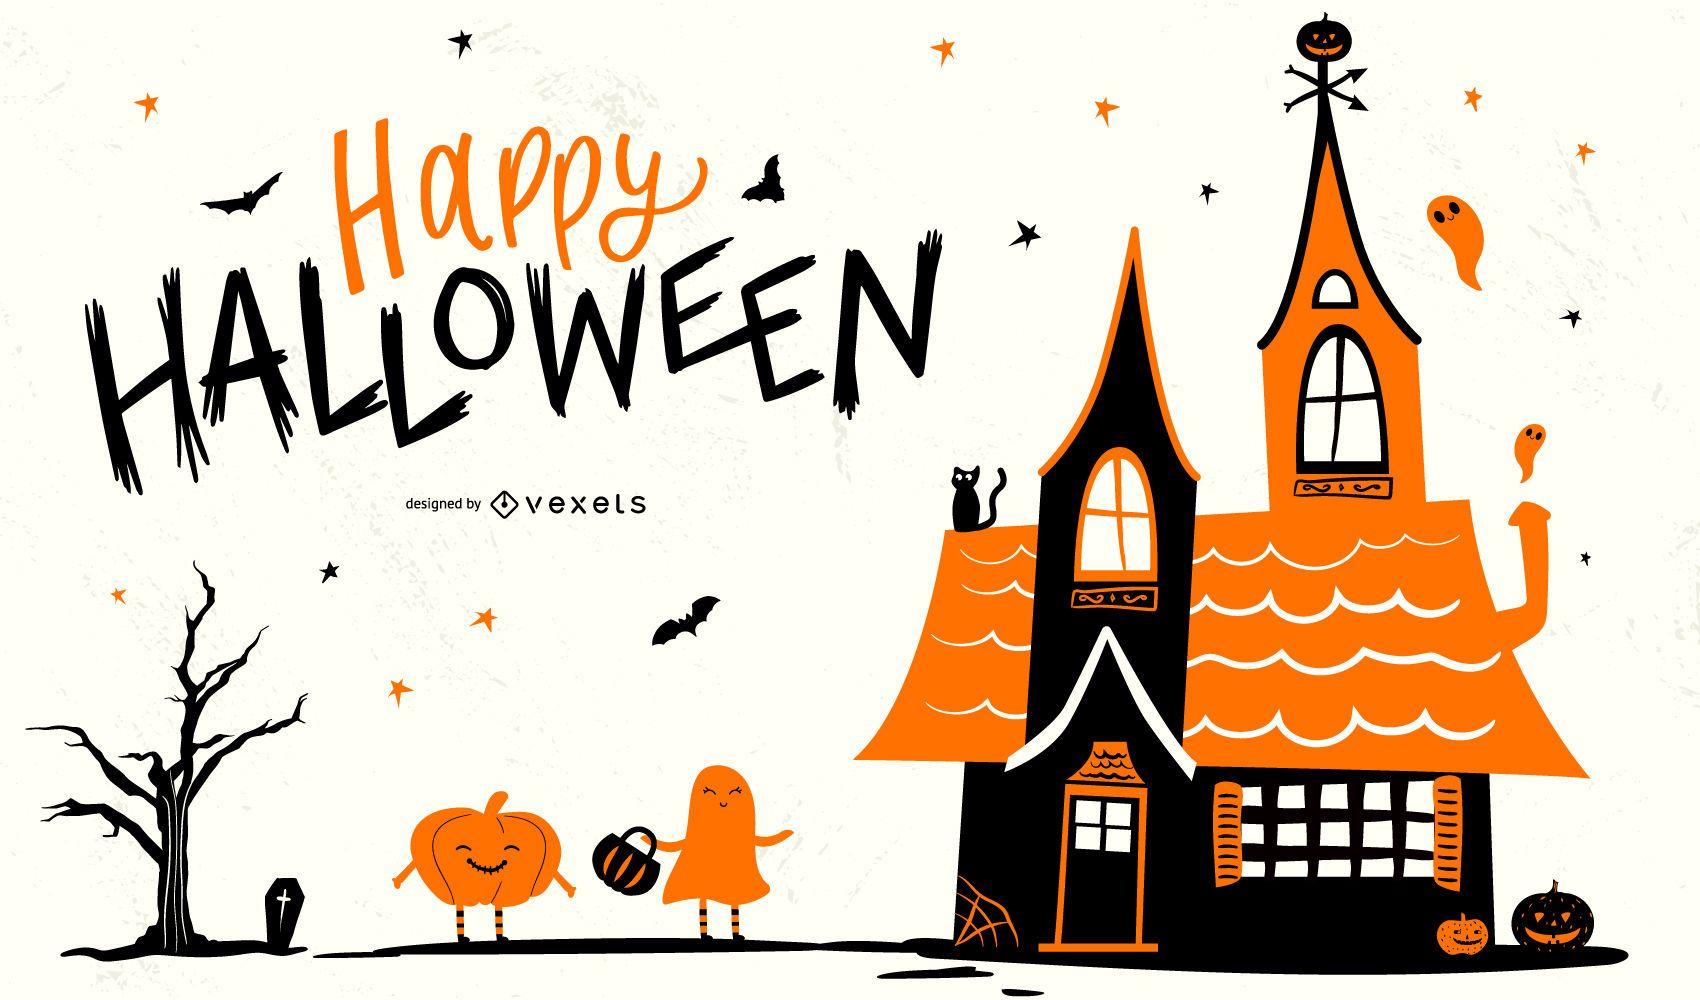 Dise?o de fondo feliz halloween